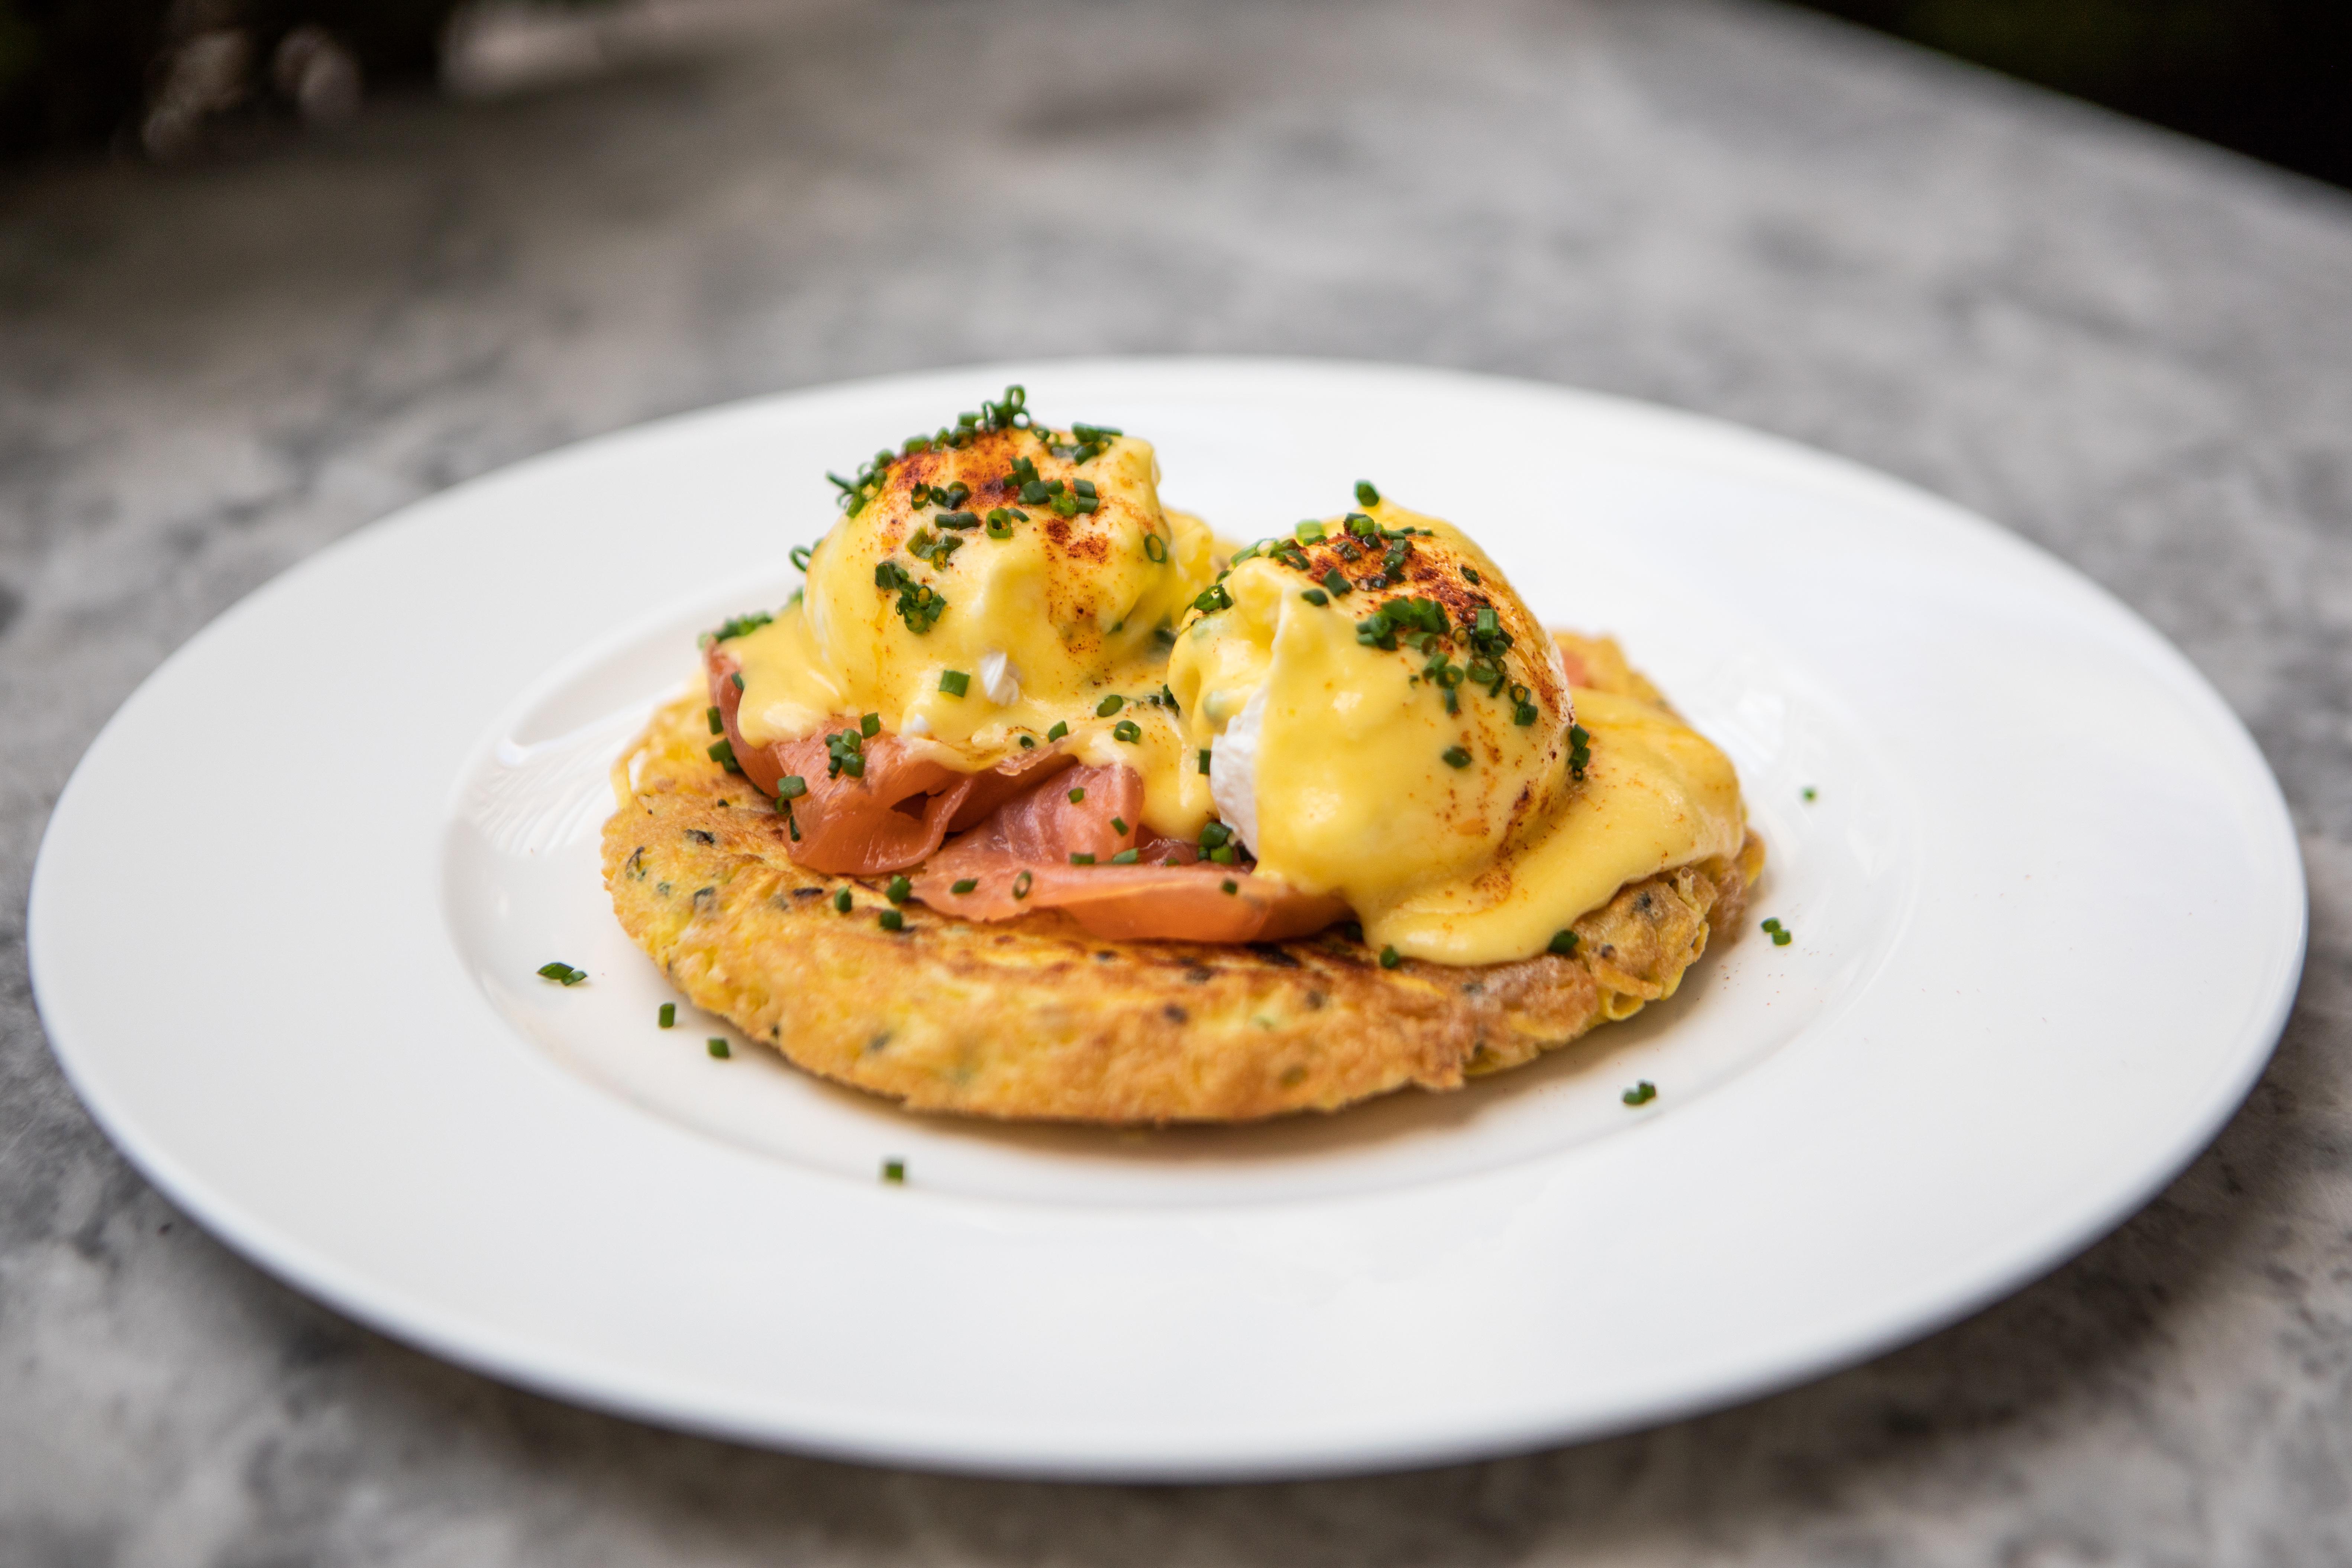 Sartoria pasta brunch, Sartoria brunch review, Sartoria brunch menu, where to eat in london this week